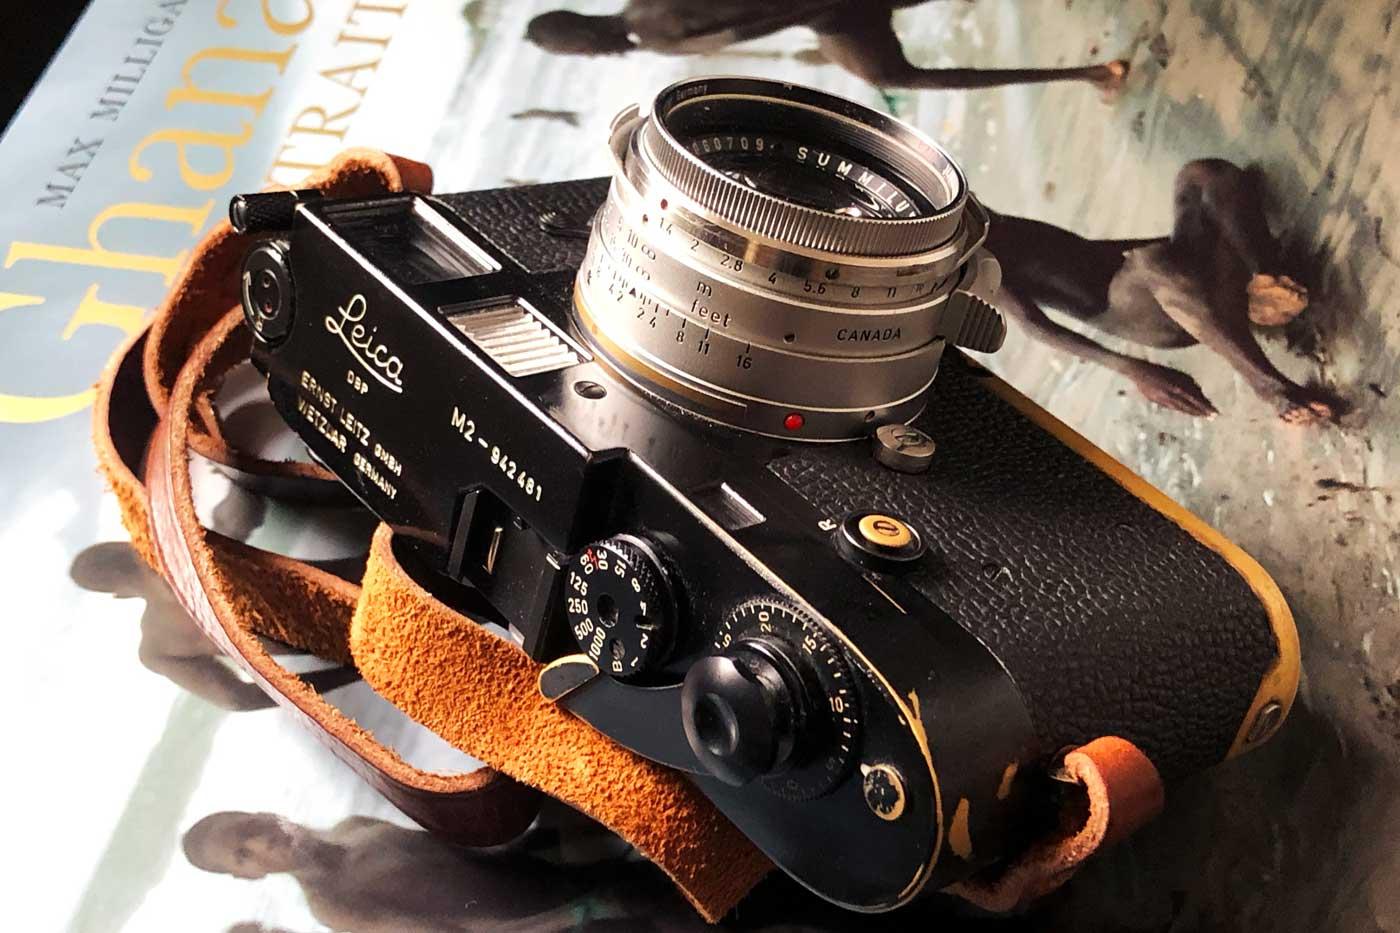 Leica-Summilux-35mm-35-1.4-f1.4-pre-a-asph-steel-rim-v1-version-1-steel-rim-lens-review-camera-film-gear-lenses-character-samples